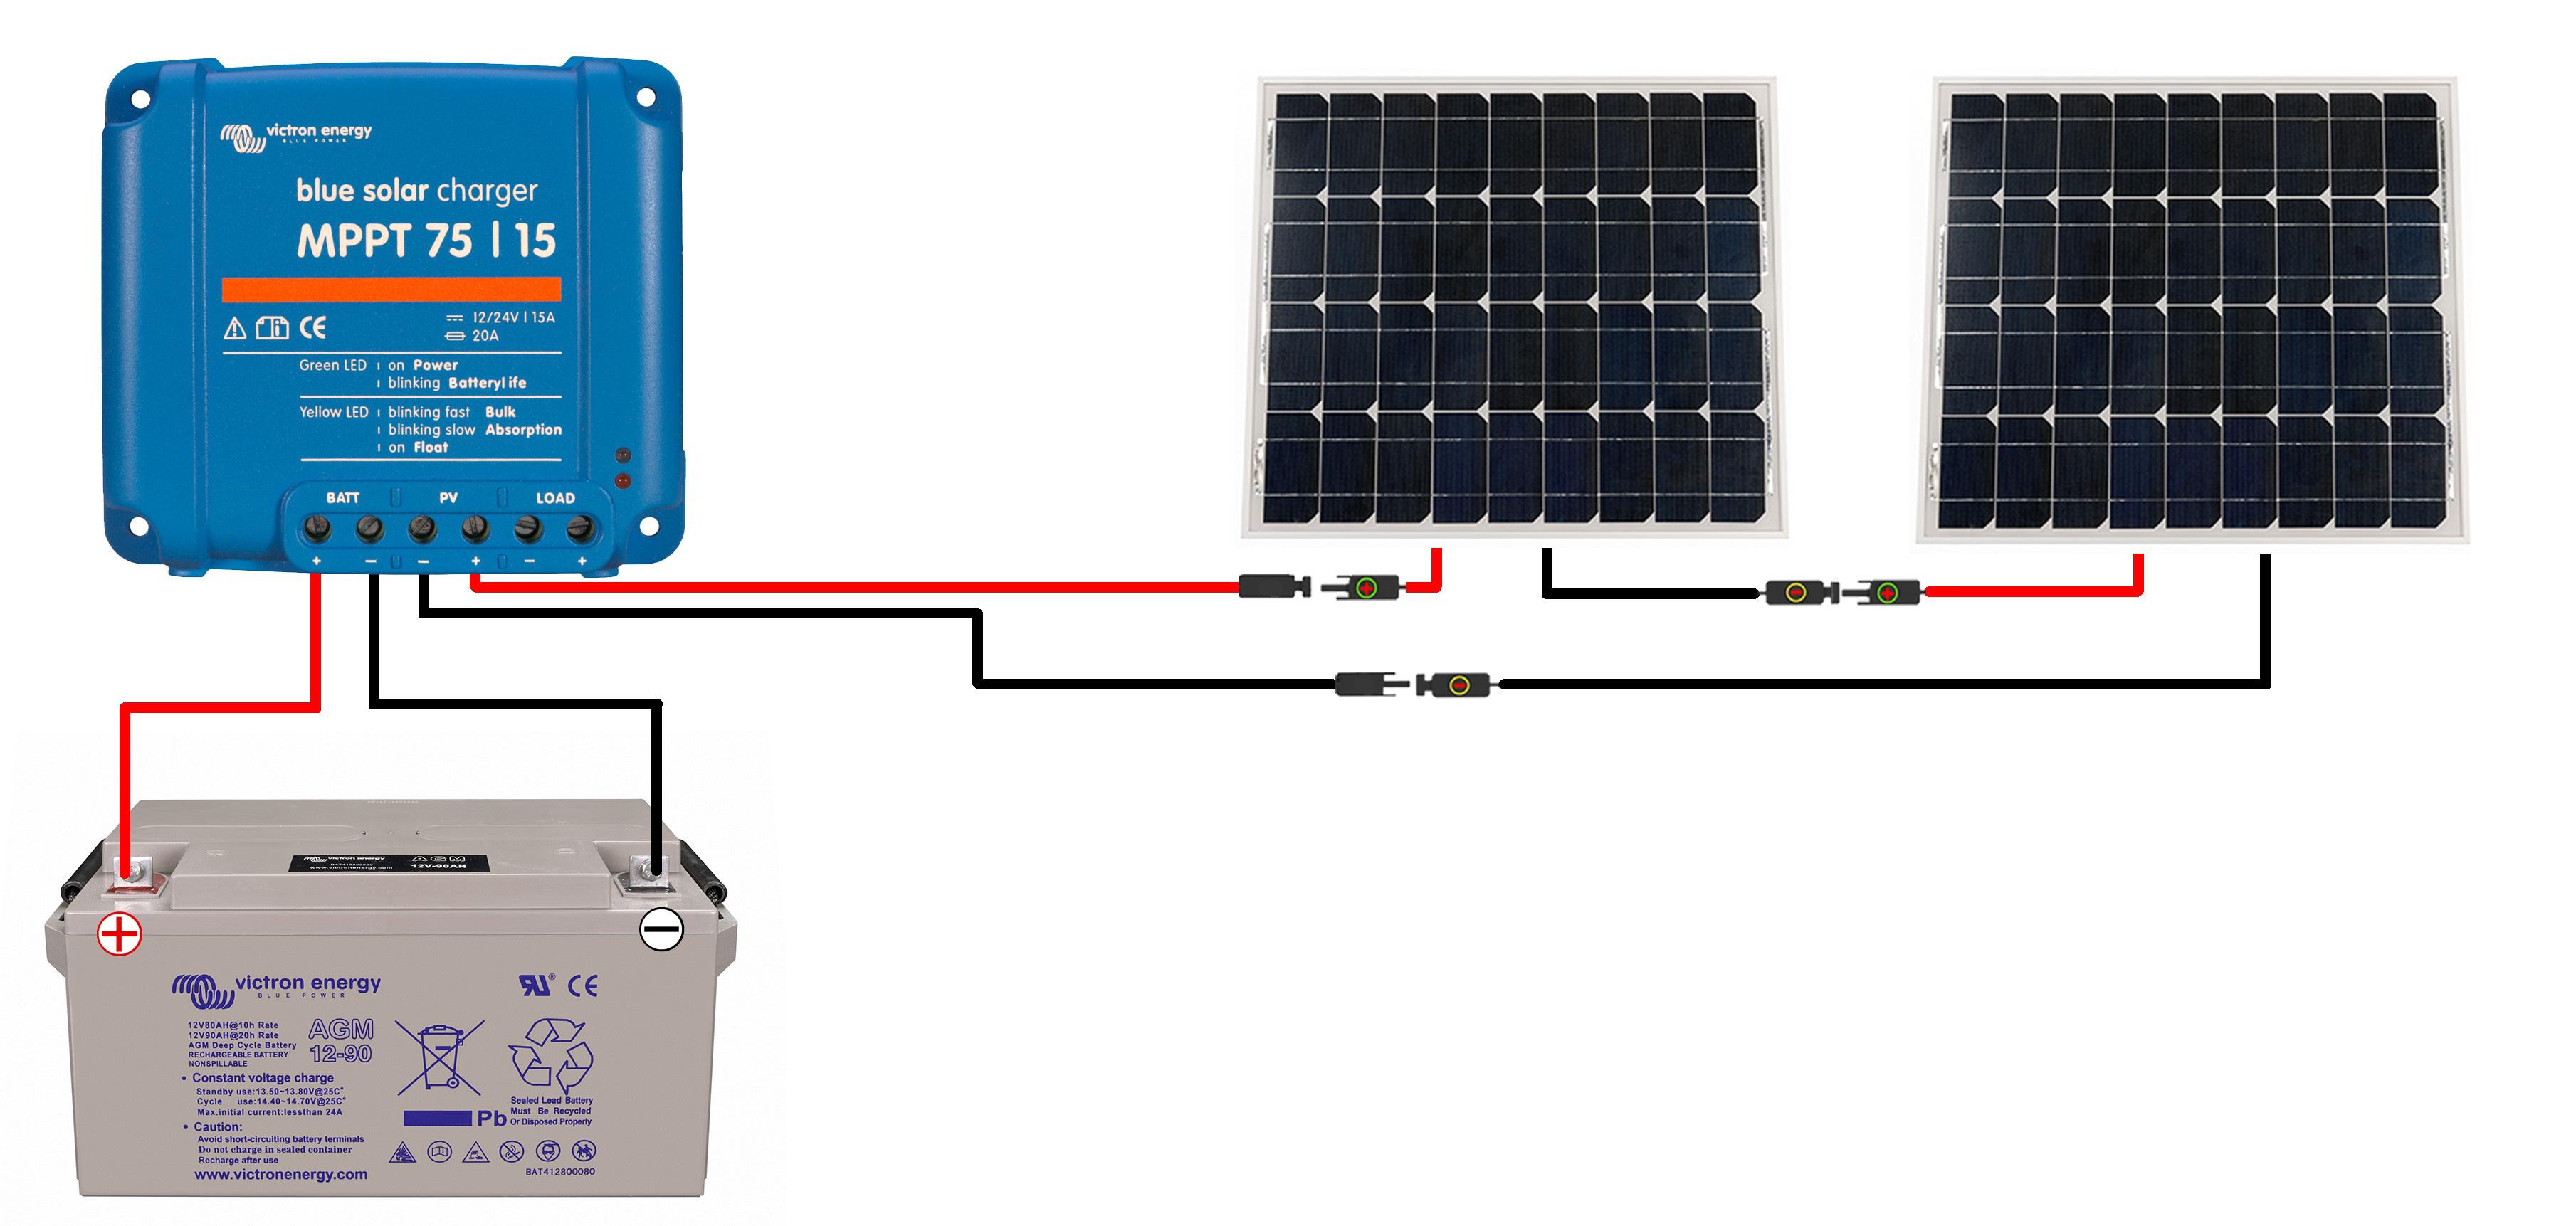 batterie solaire qui chauffe